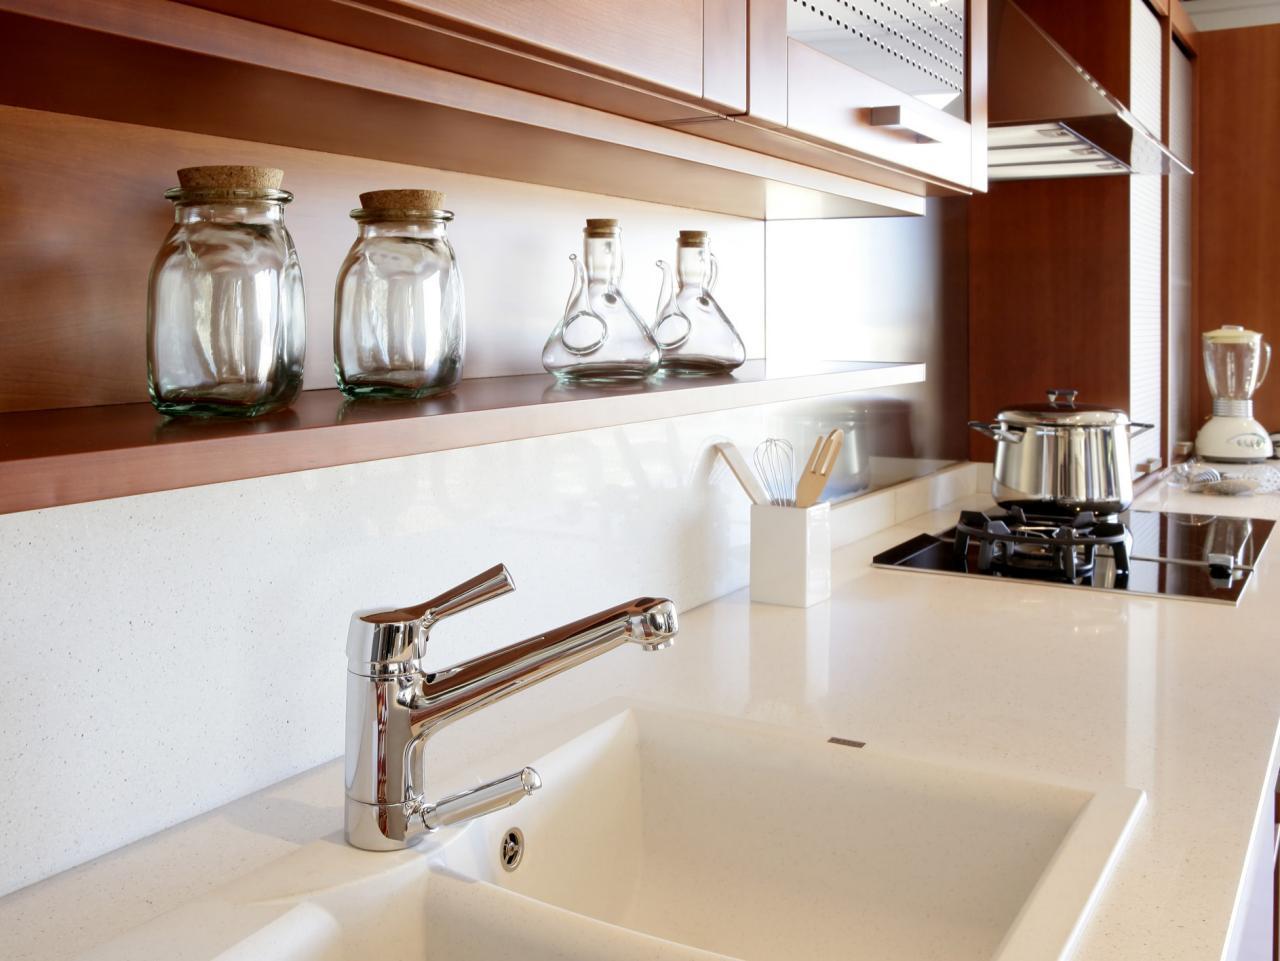 corian kitchen counters